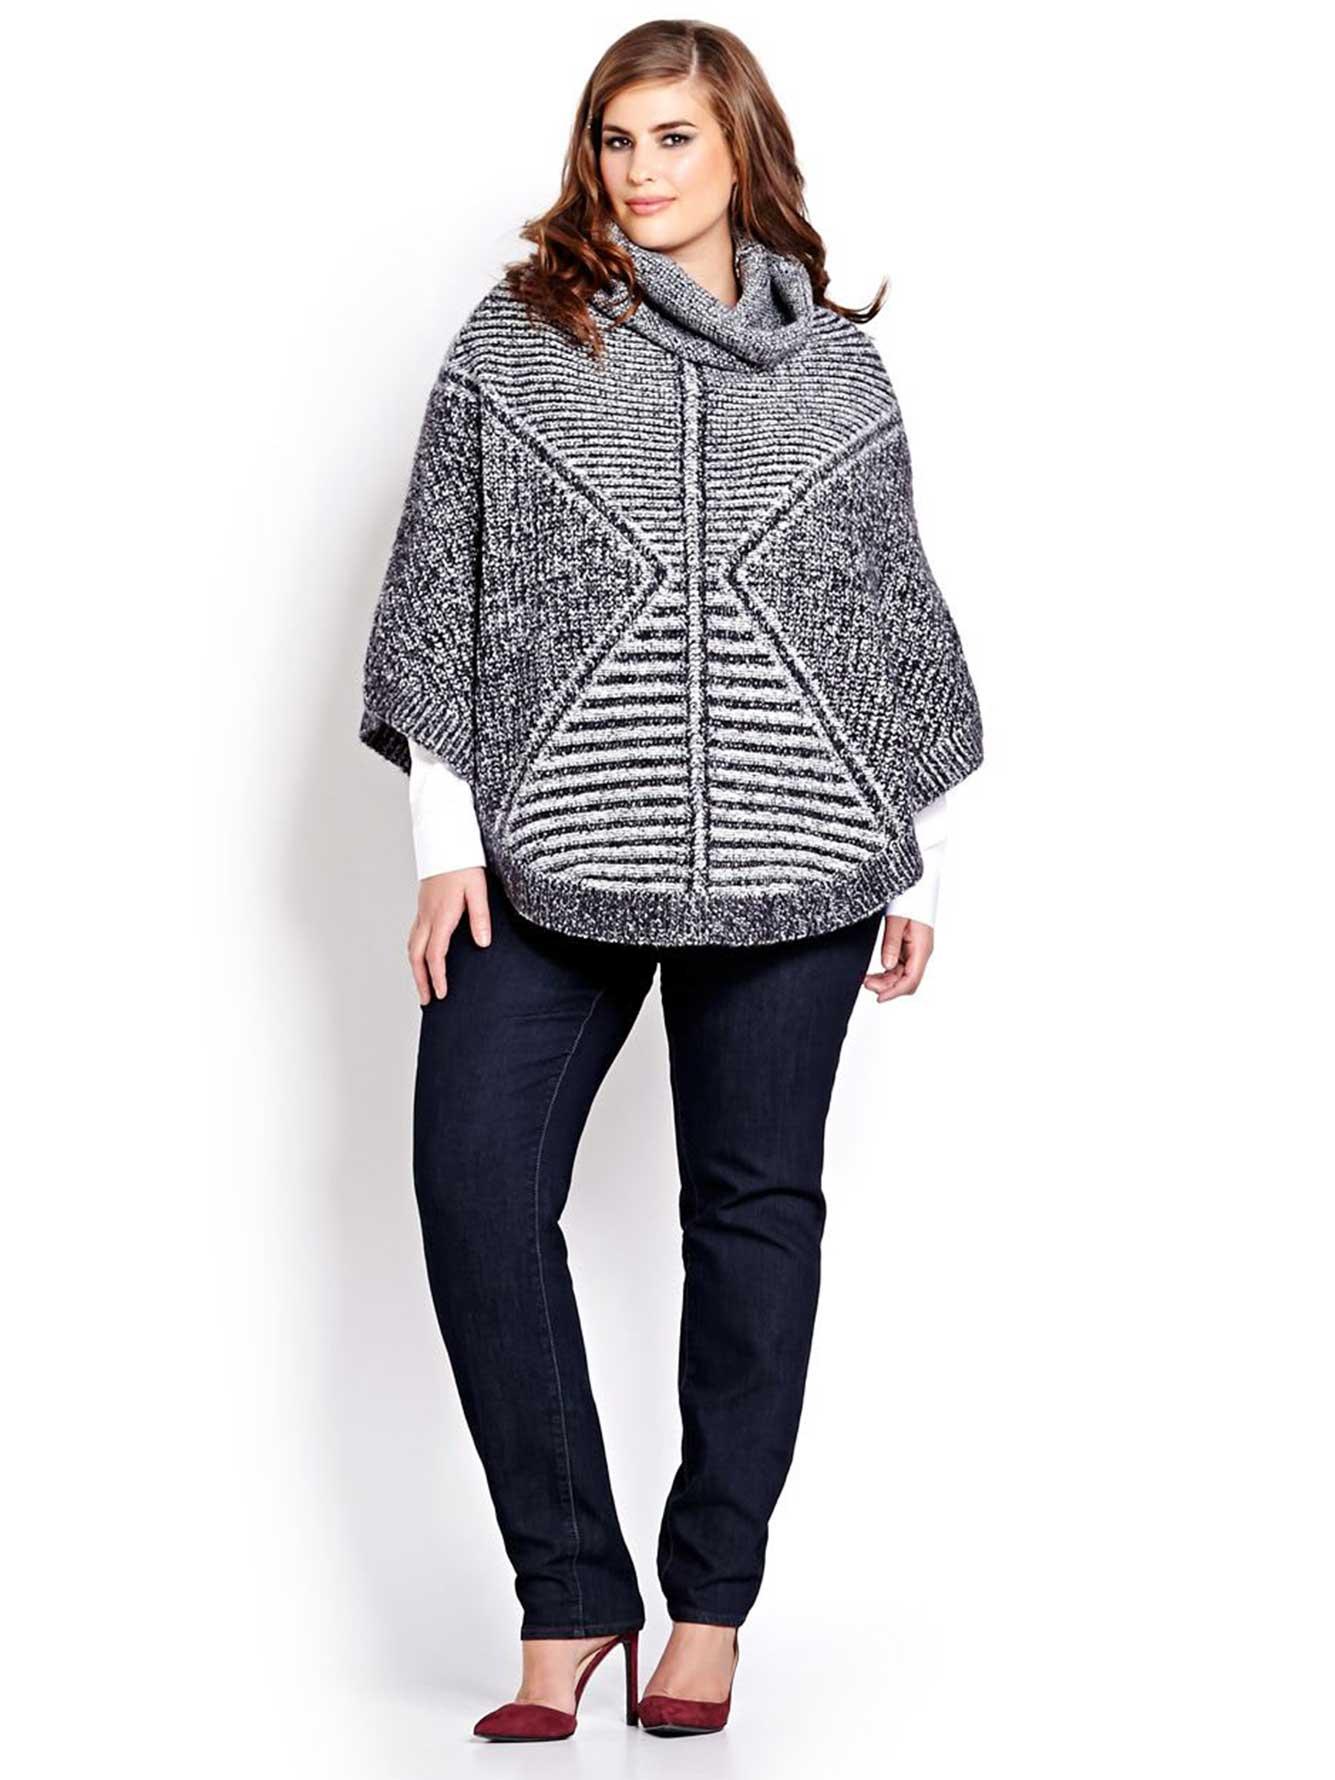 Dkny Sweaters On Sale Aztec Sweater Dress